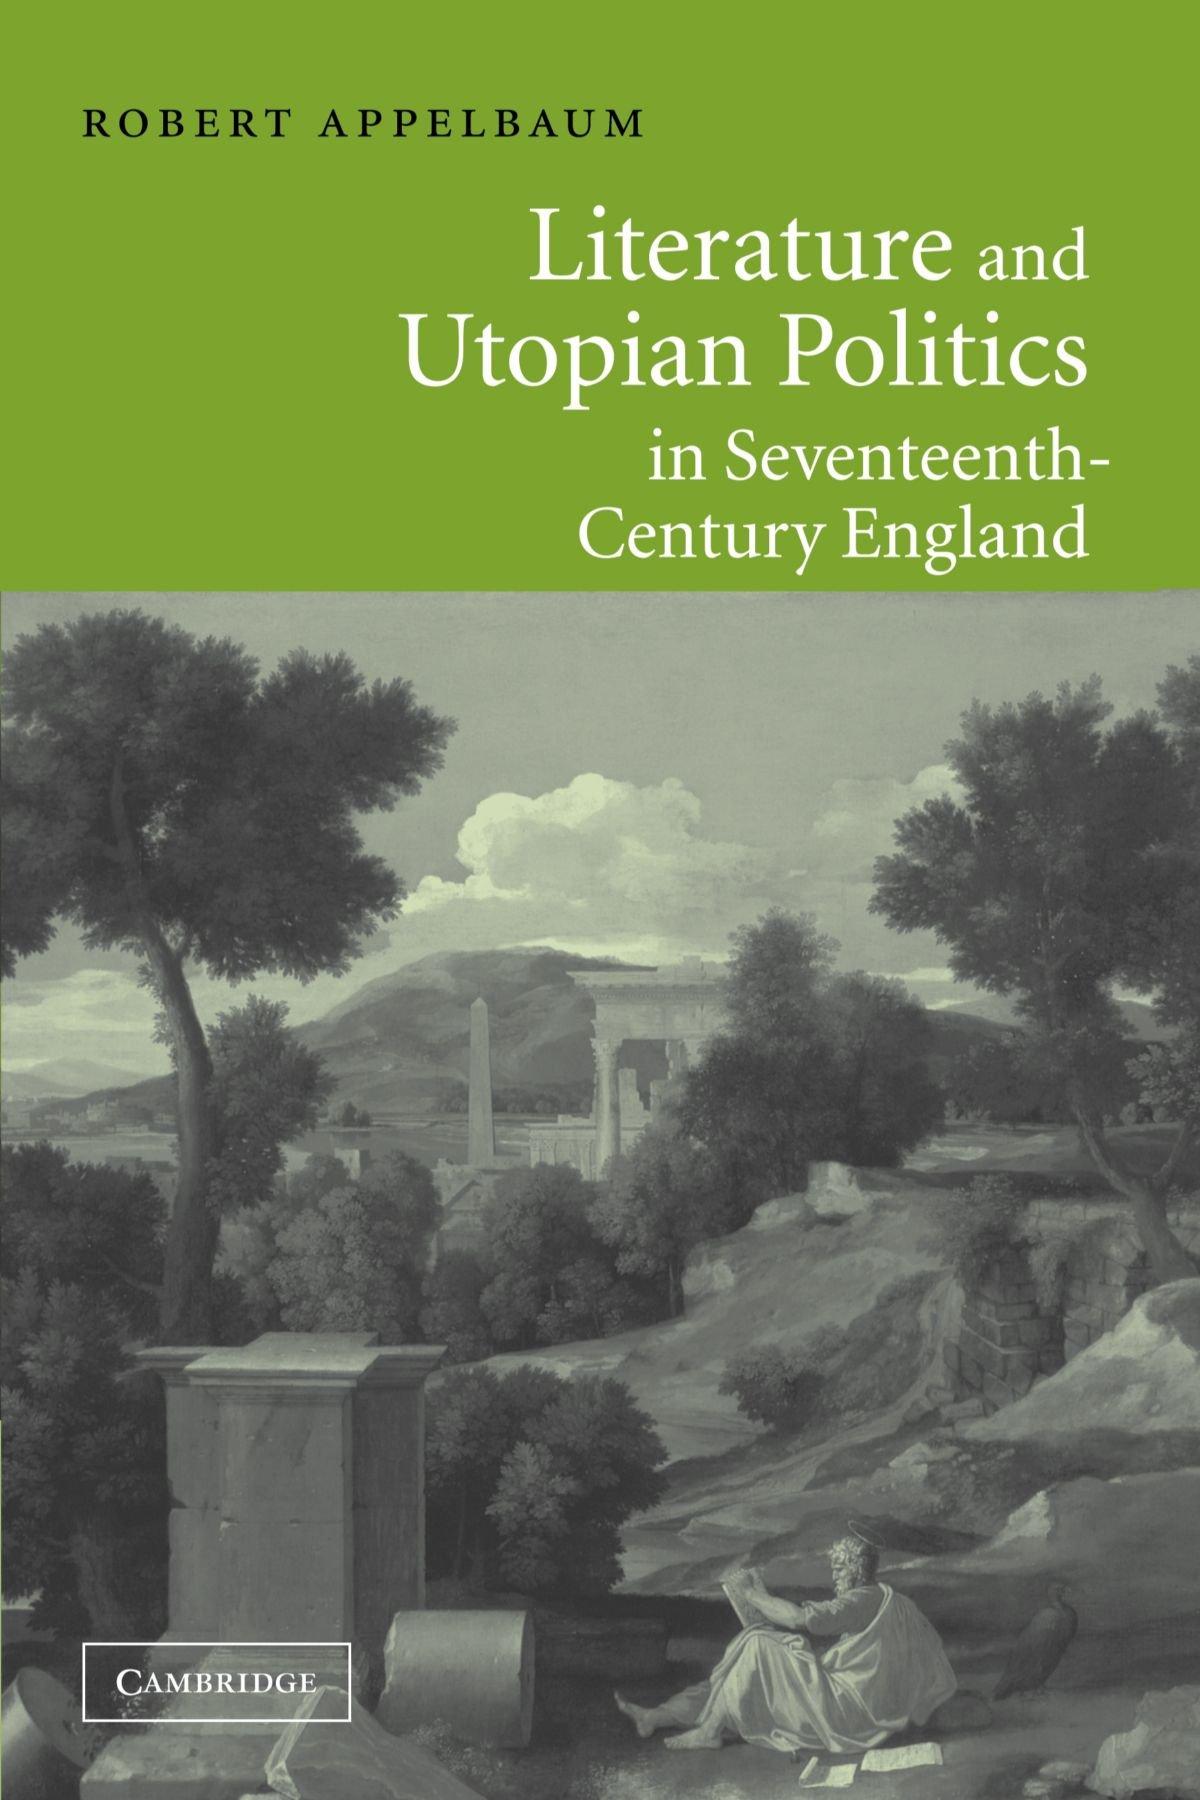 Literature and Utopian Politics in Seventeenth-Century England pdf epub